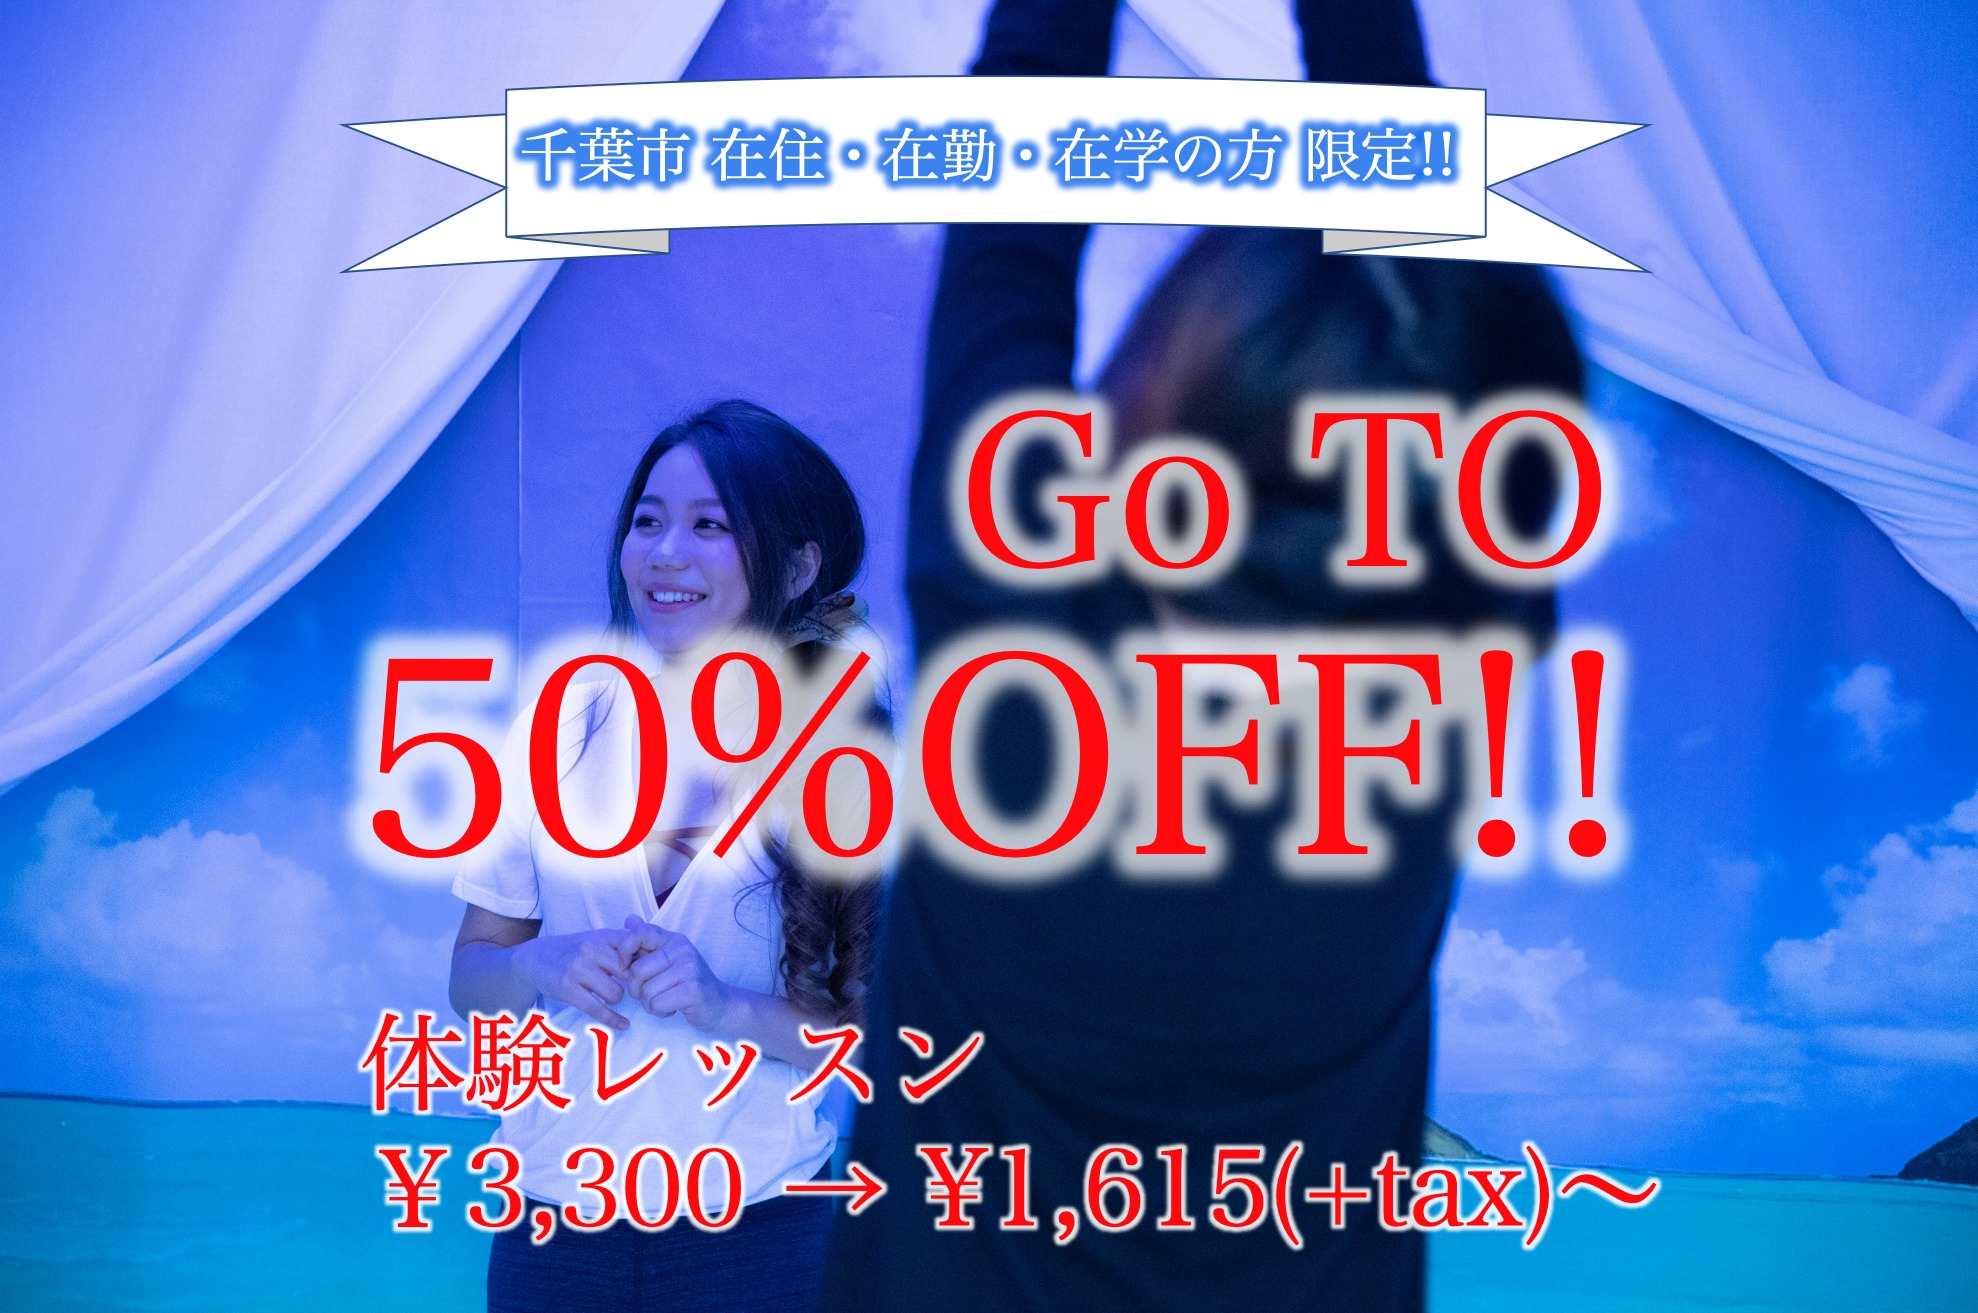 50%OFF【千葉市の方、半額!?】キャンペーン